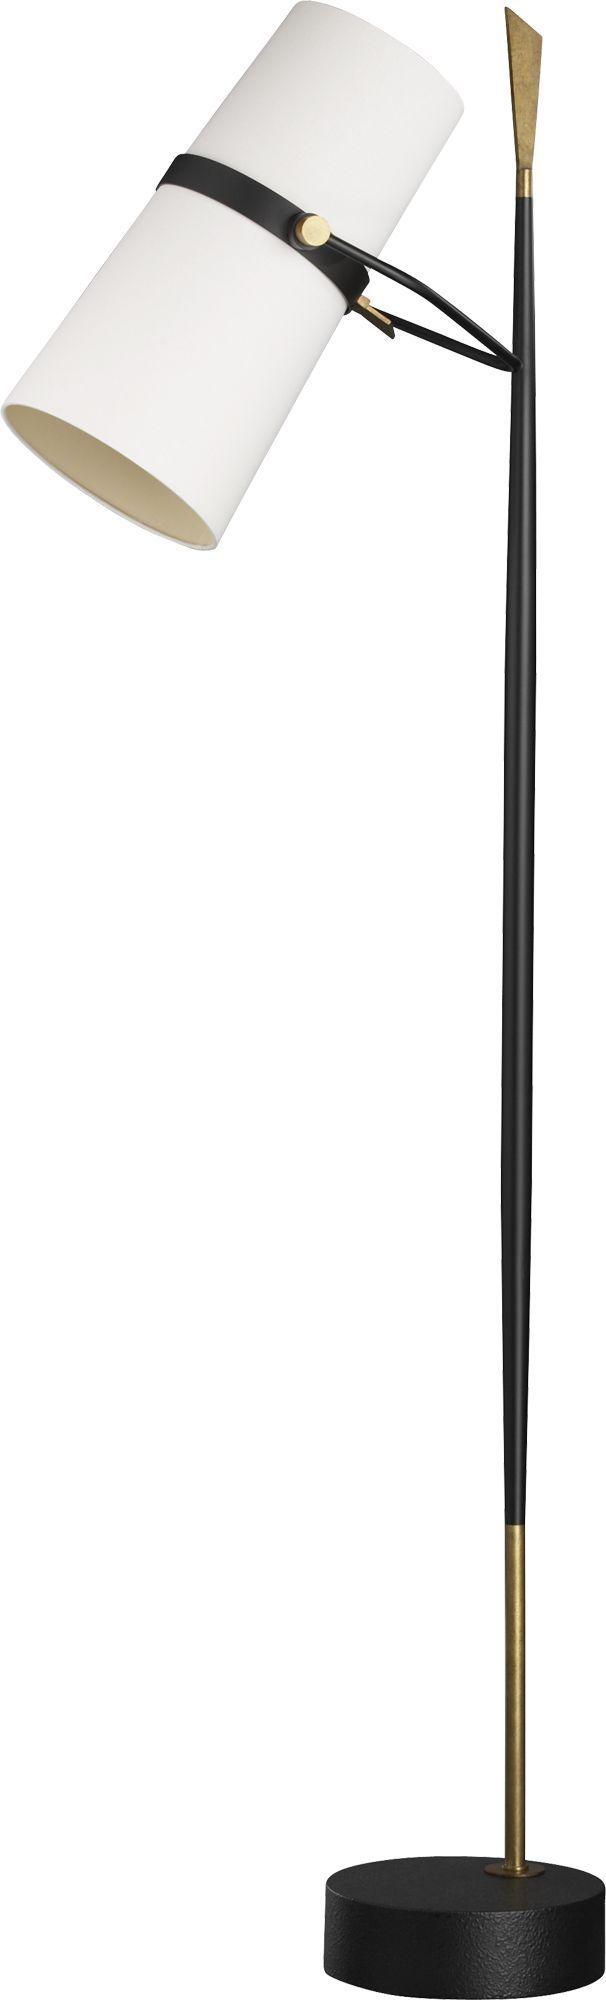 Riston Floor Lamp   Floor lamp, Contemporary floor lamps ... on Riston Floor Lamp  id=58282